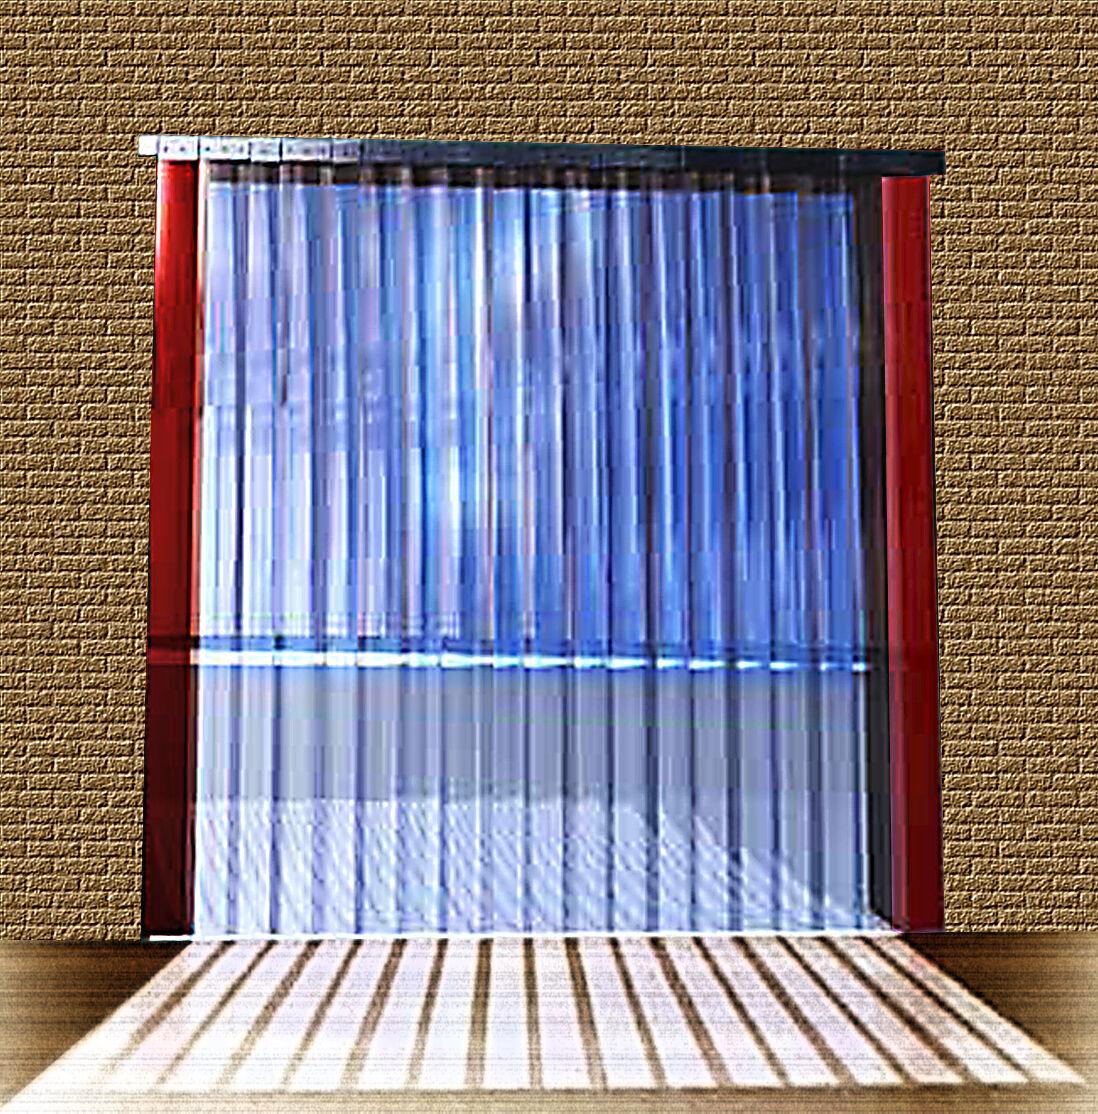 B B B 2 75m x H2 75m Lamellen PVC Streifen Vorhang 300x3mm 171b16